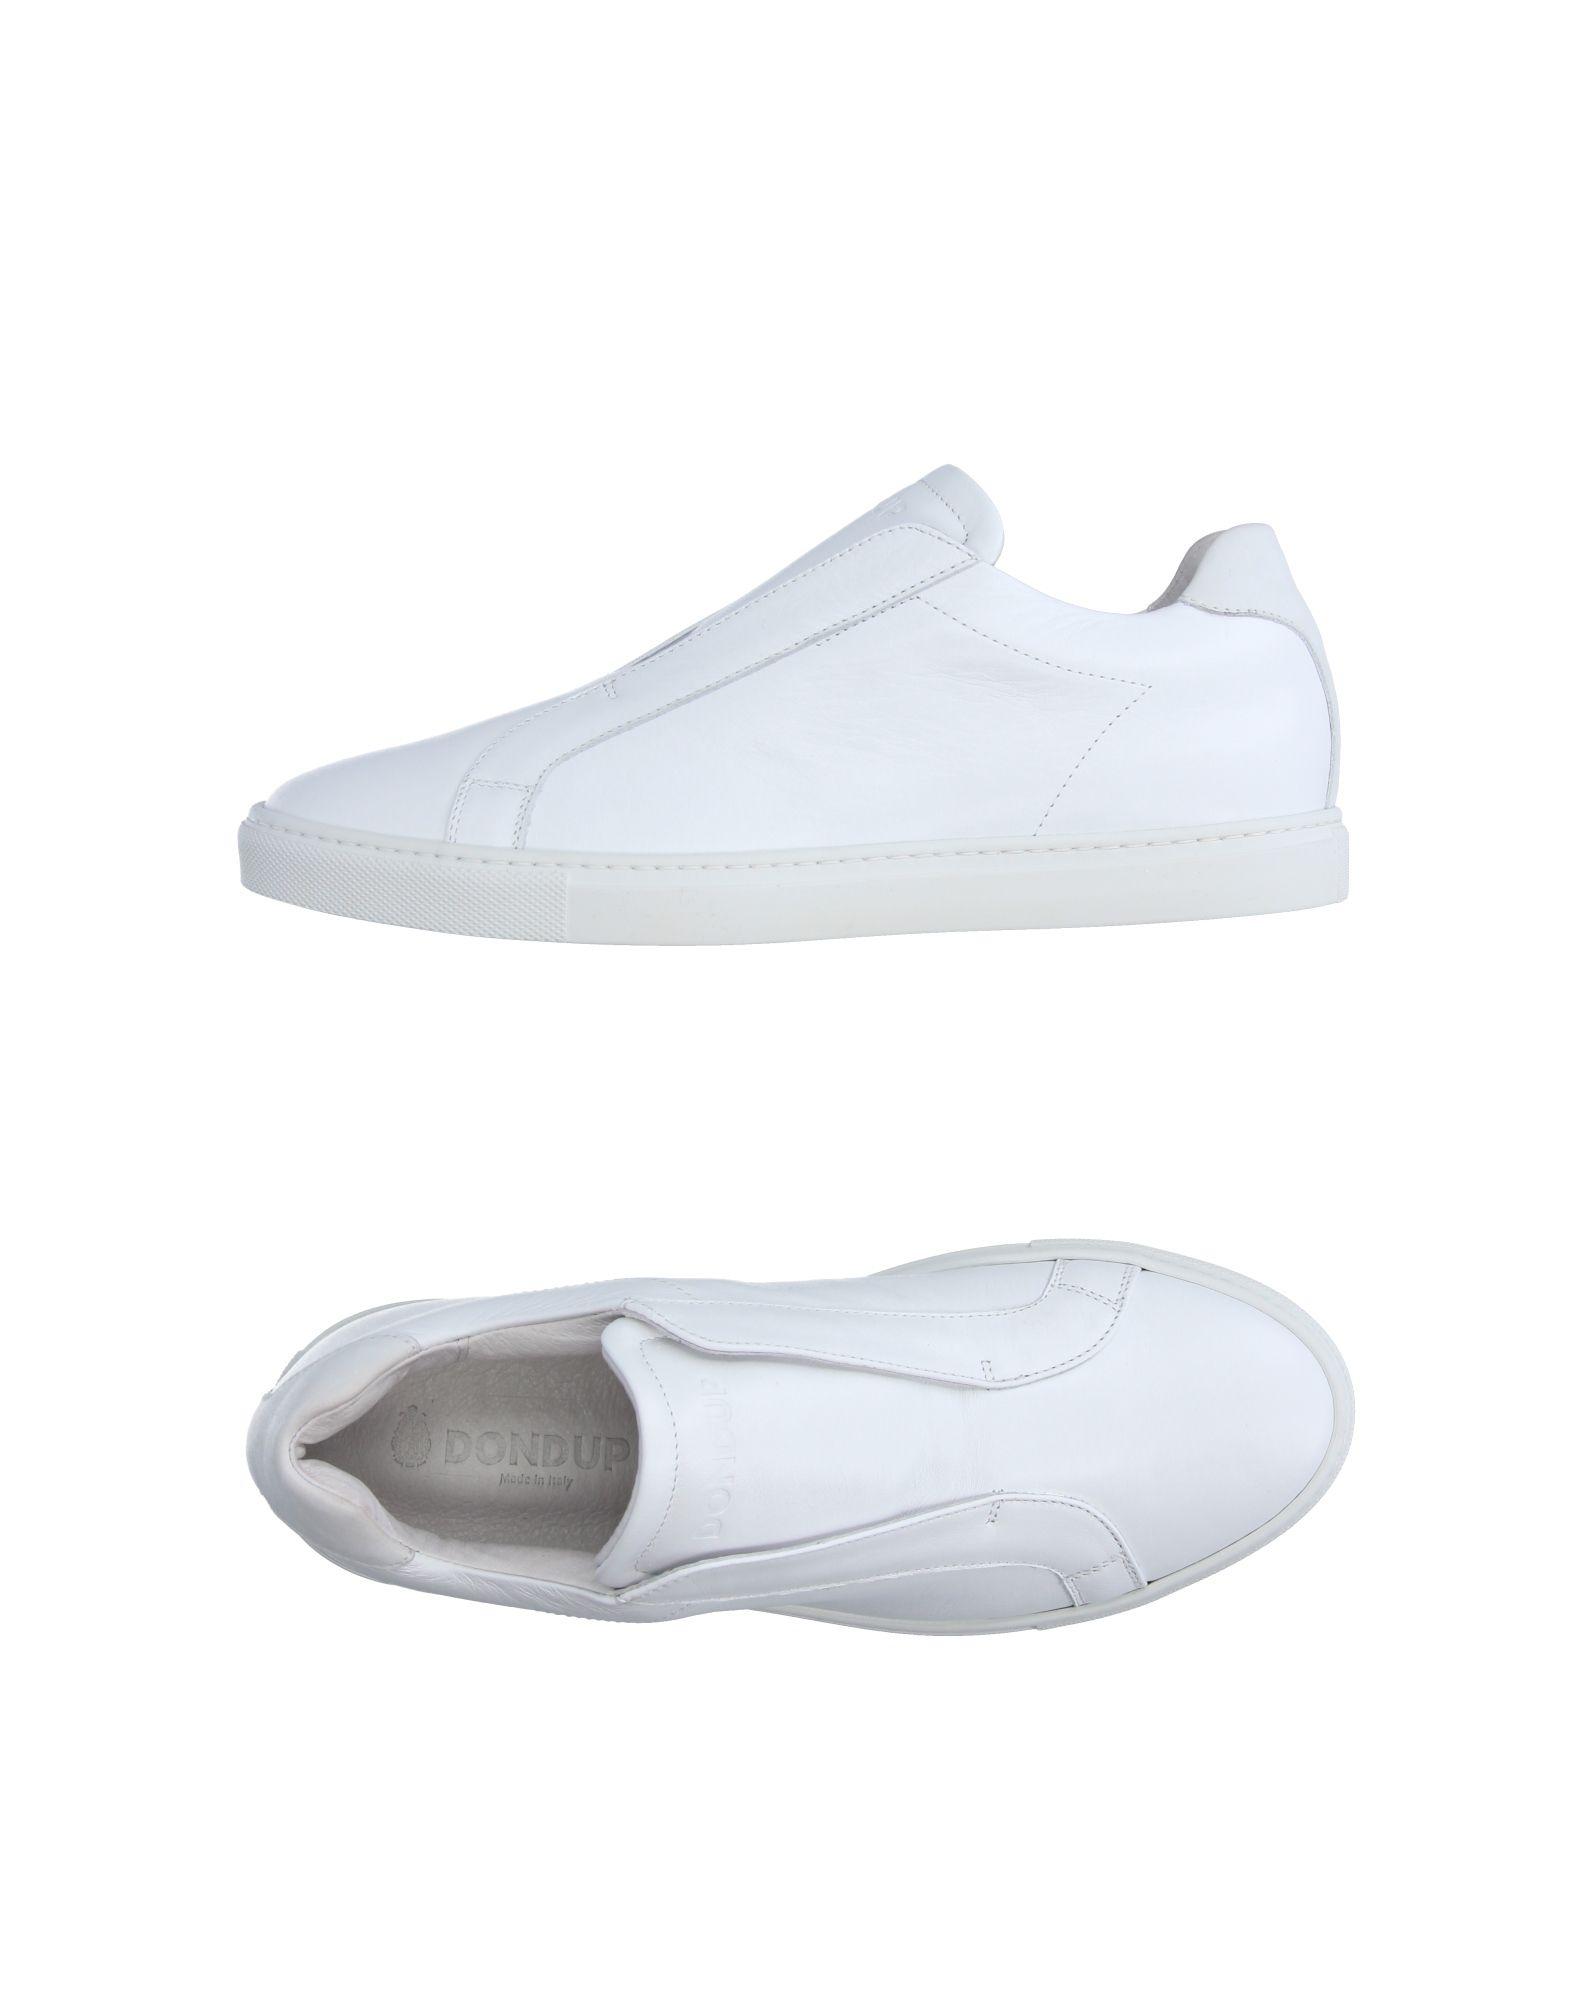 Stilvolle billige  Schuhe Dondup Sneakers Damen  billige 11213481PN bc1d62